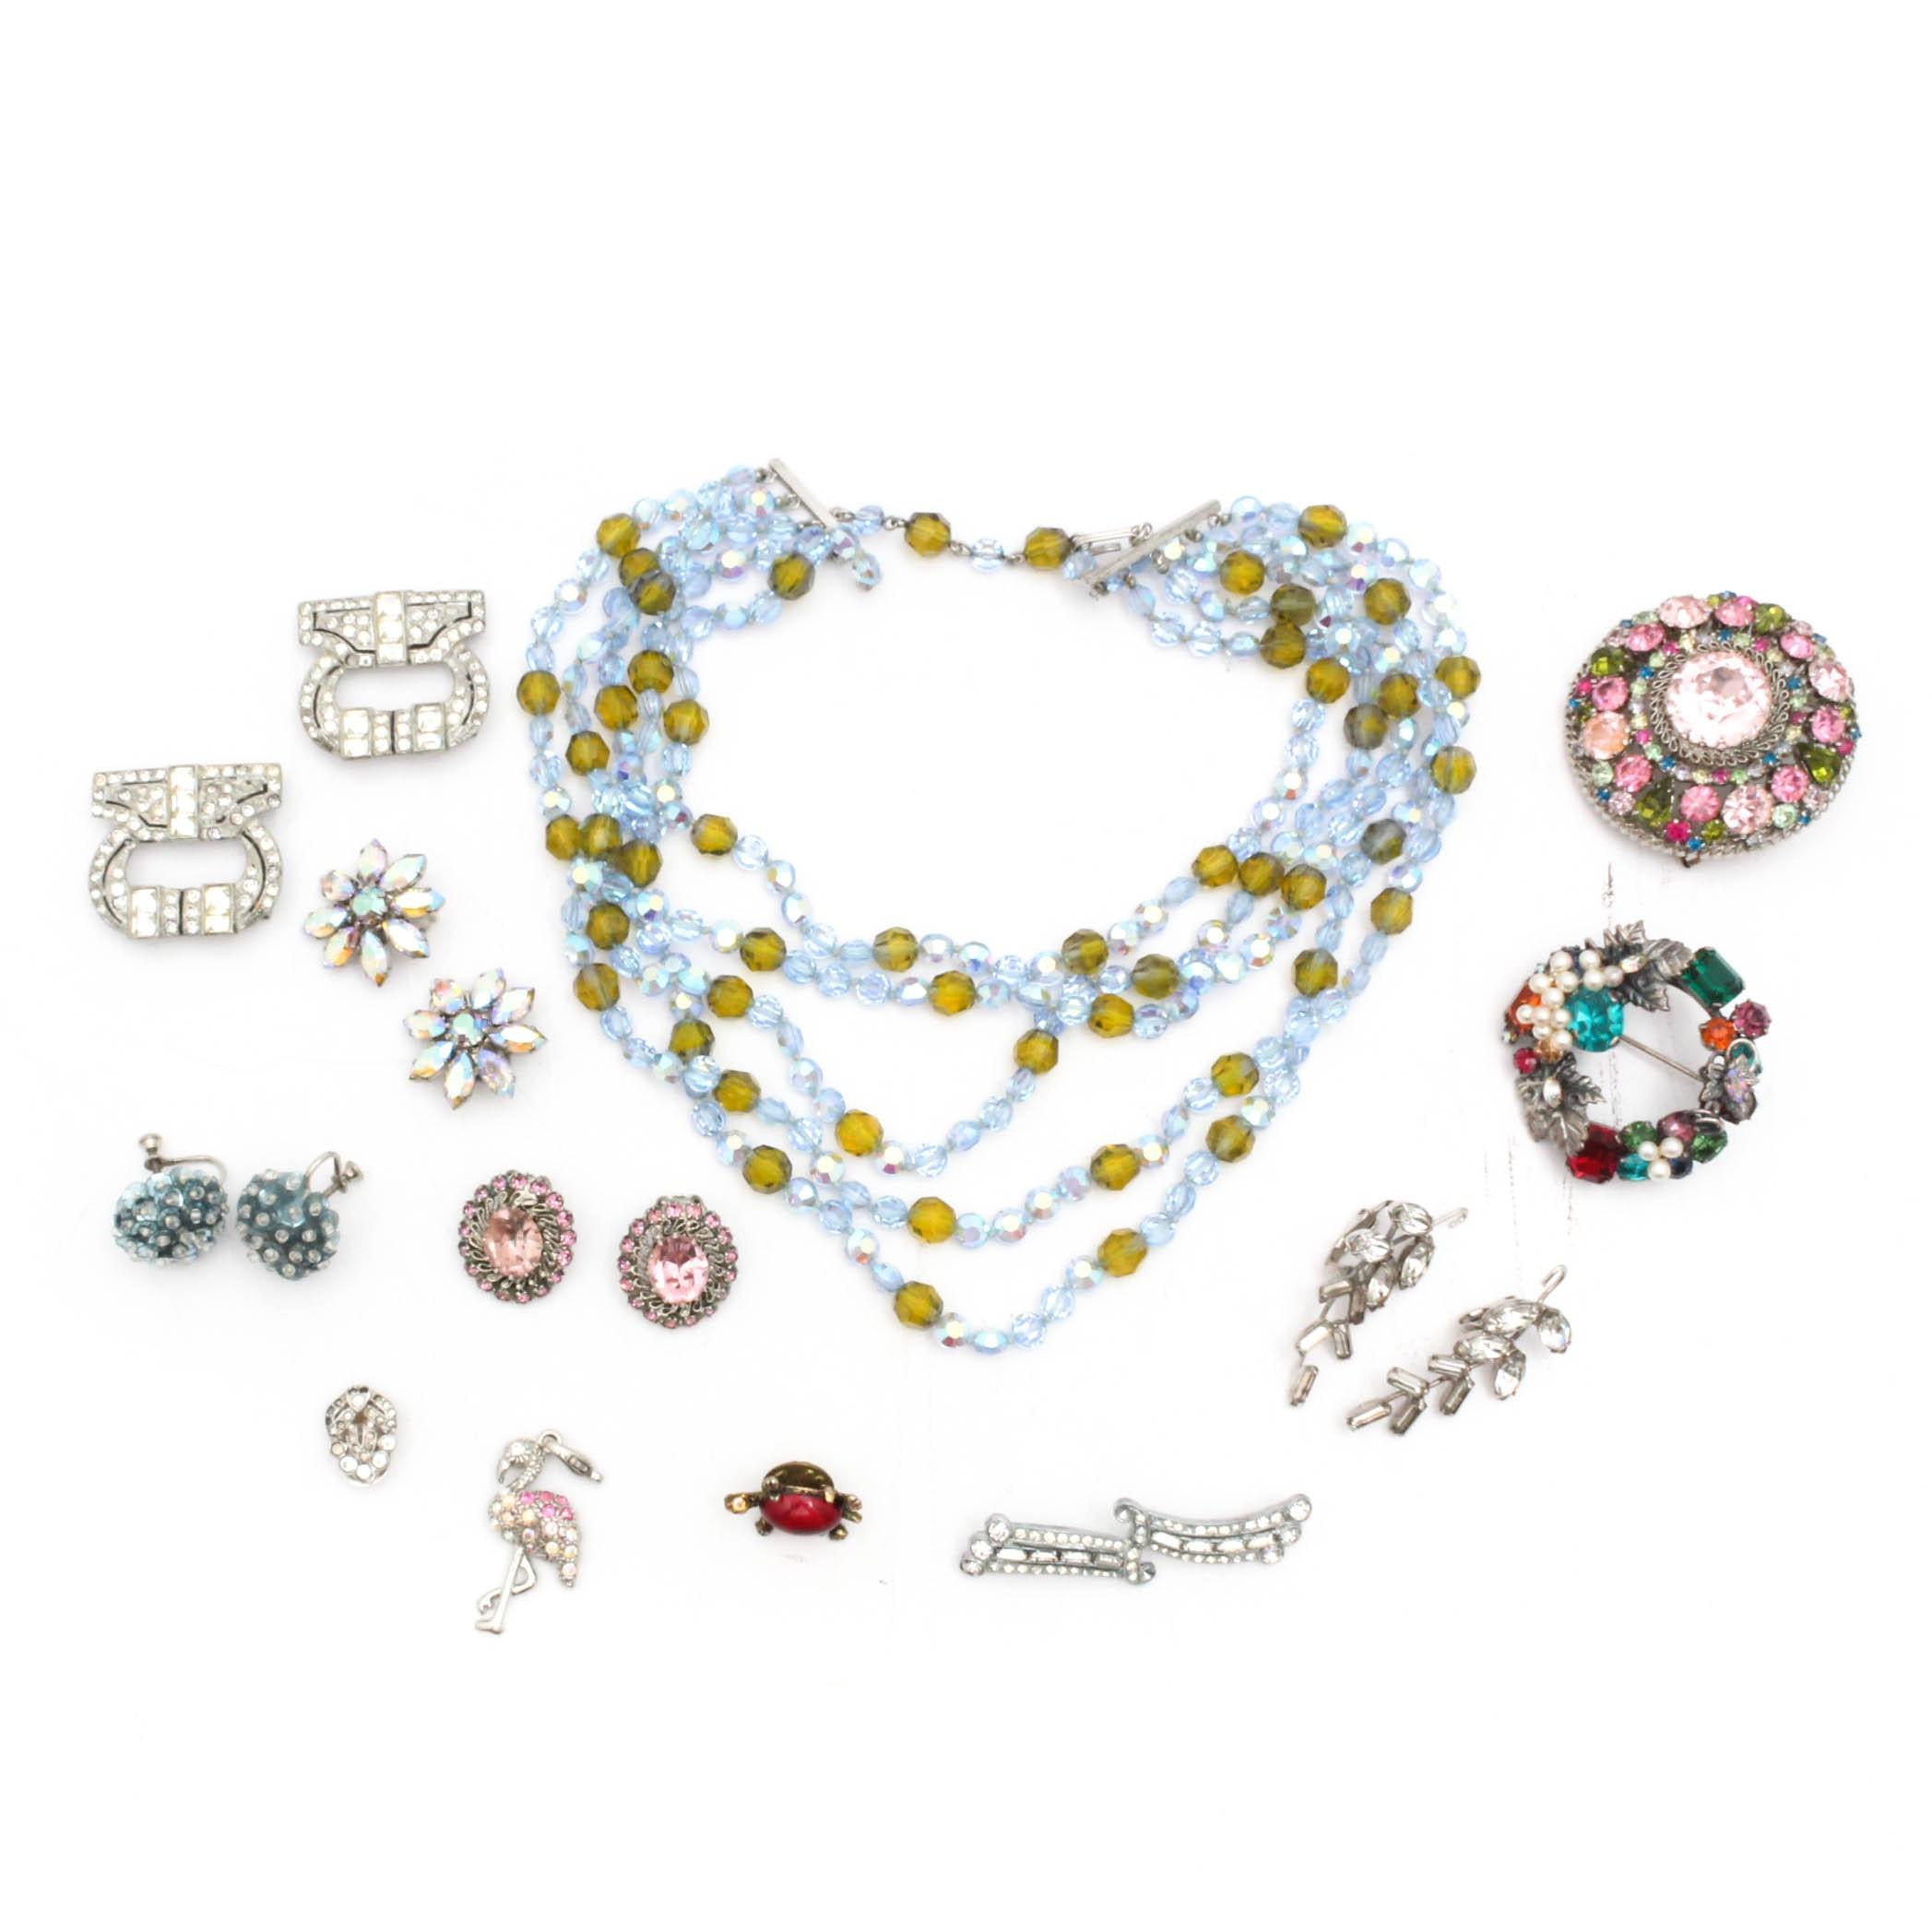 Rhinestone and Crystal Vintage Jewelry